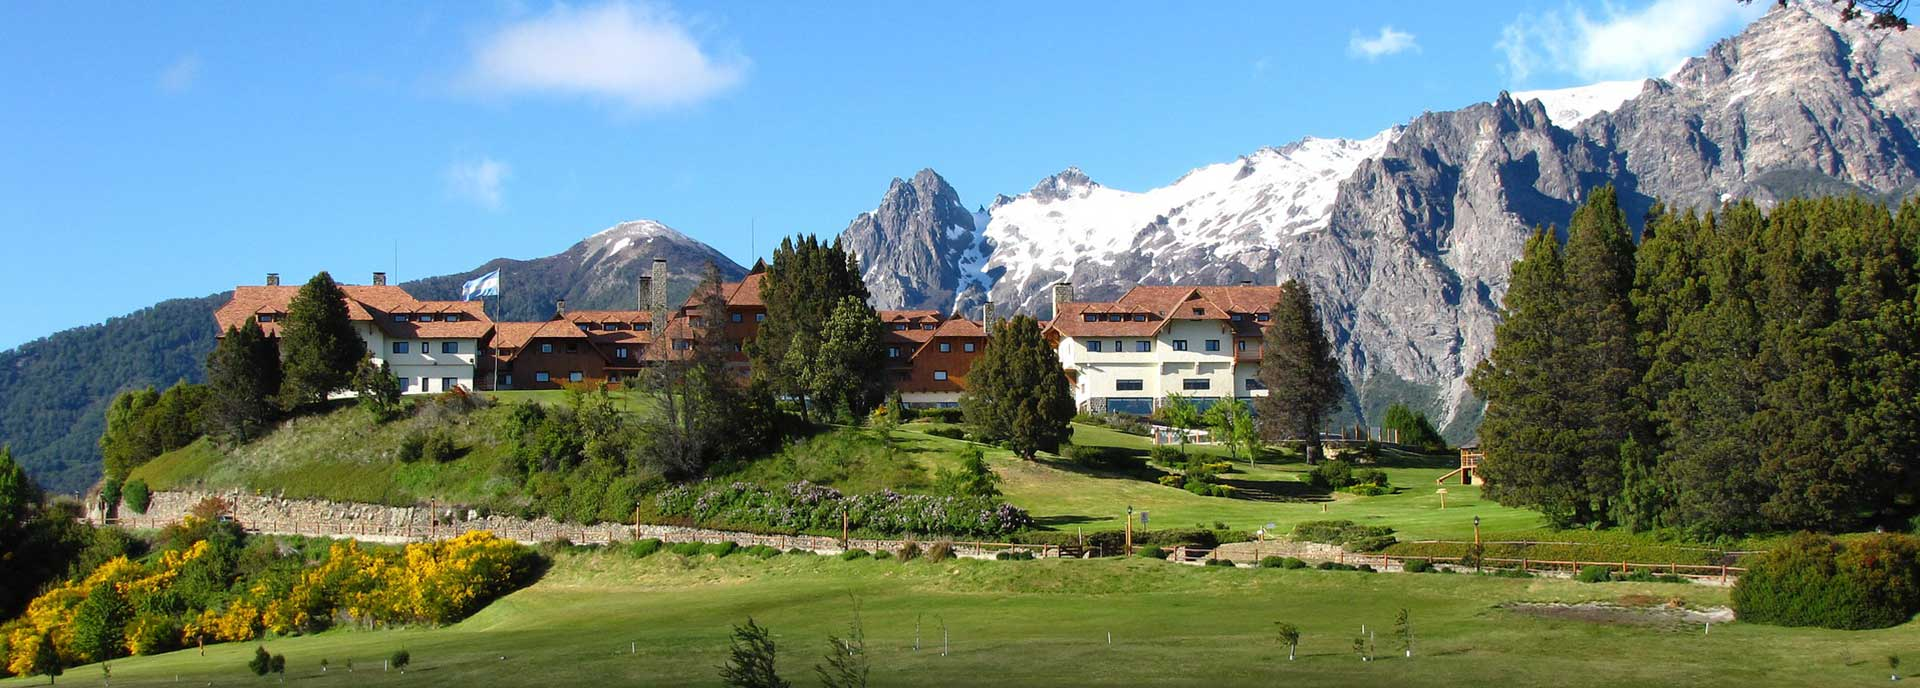 Pacote Viagem Bariloche